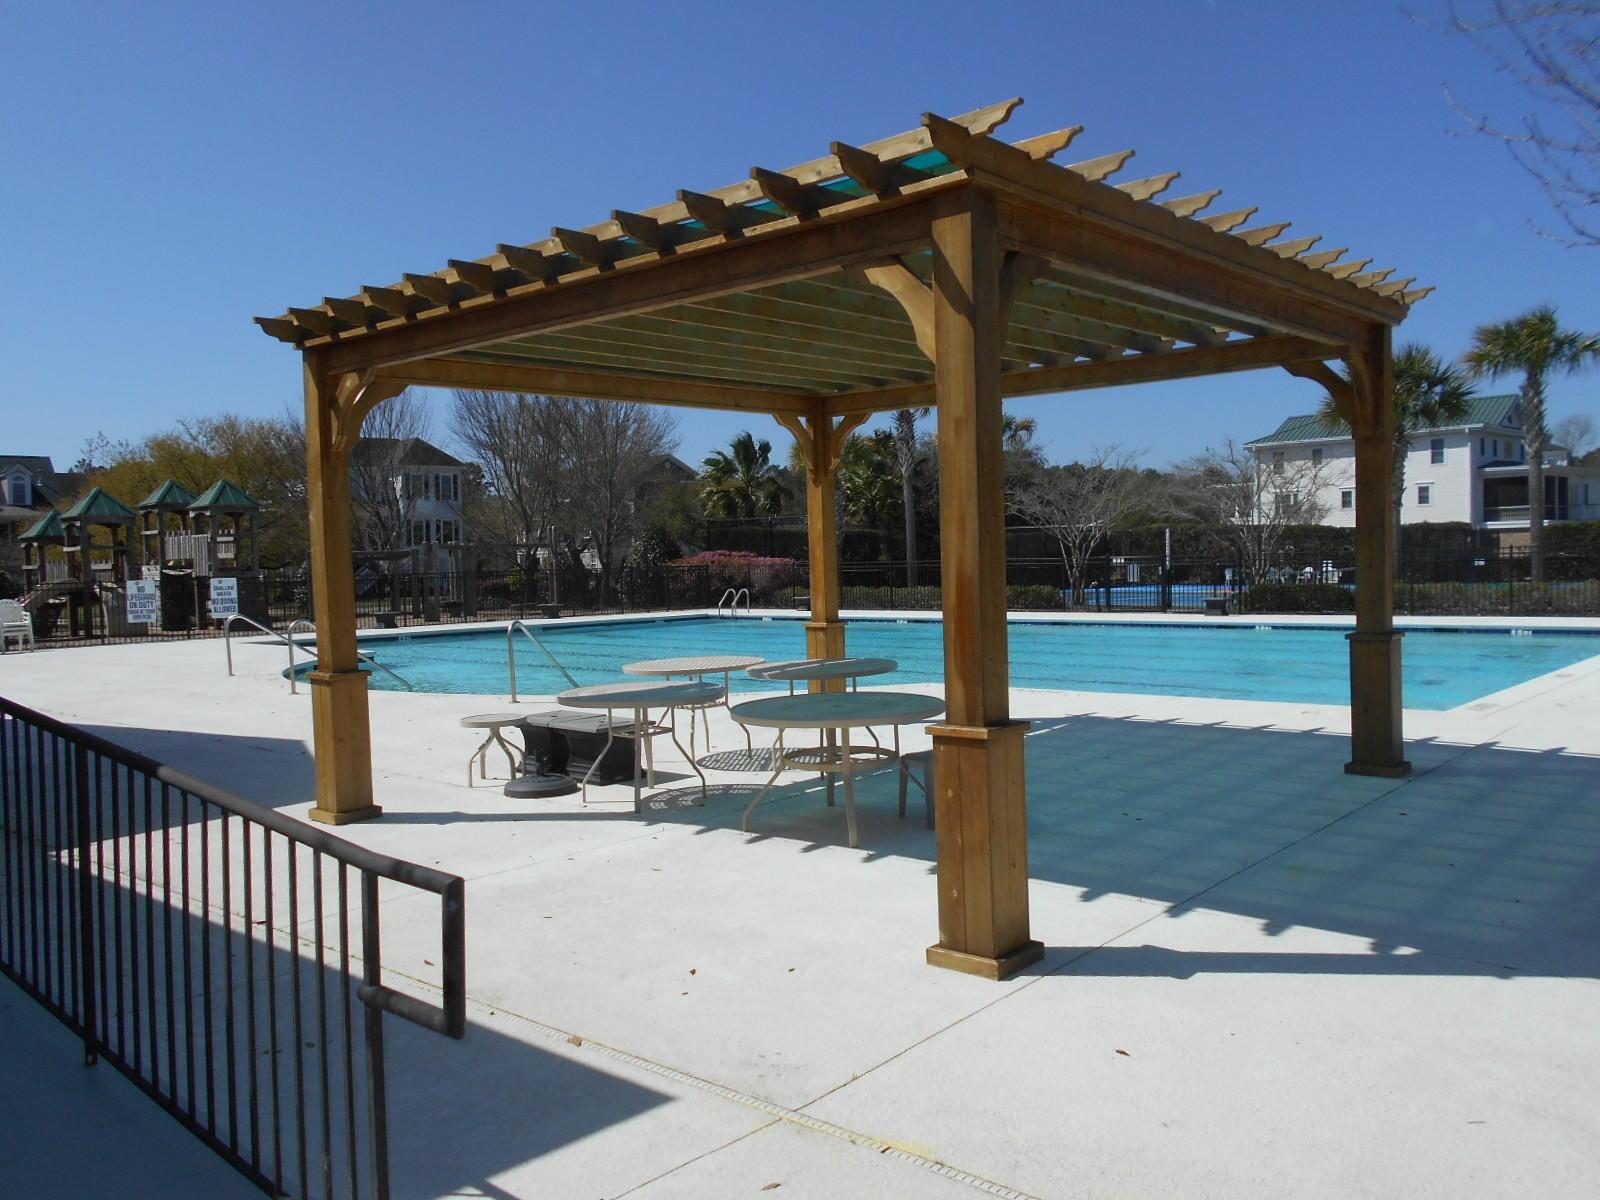 Beresford Creek Landing Homes For Sale - 1212 Winding Creek, Charleston, SC - 5